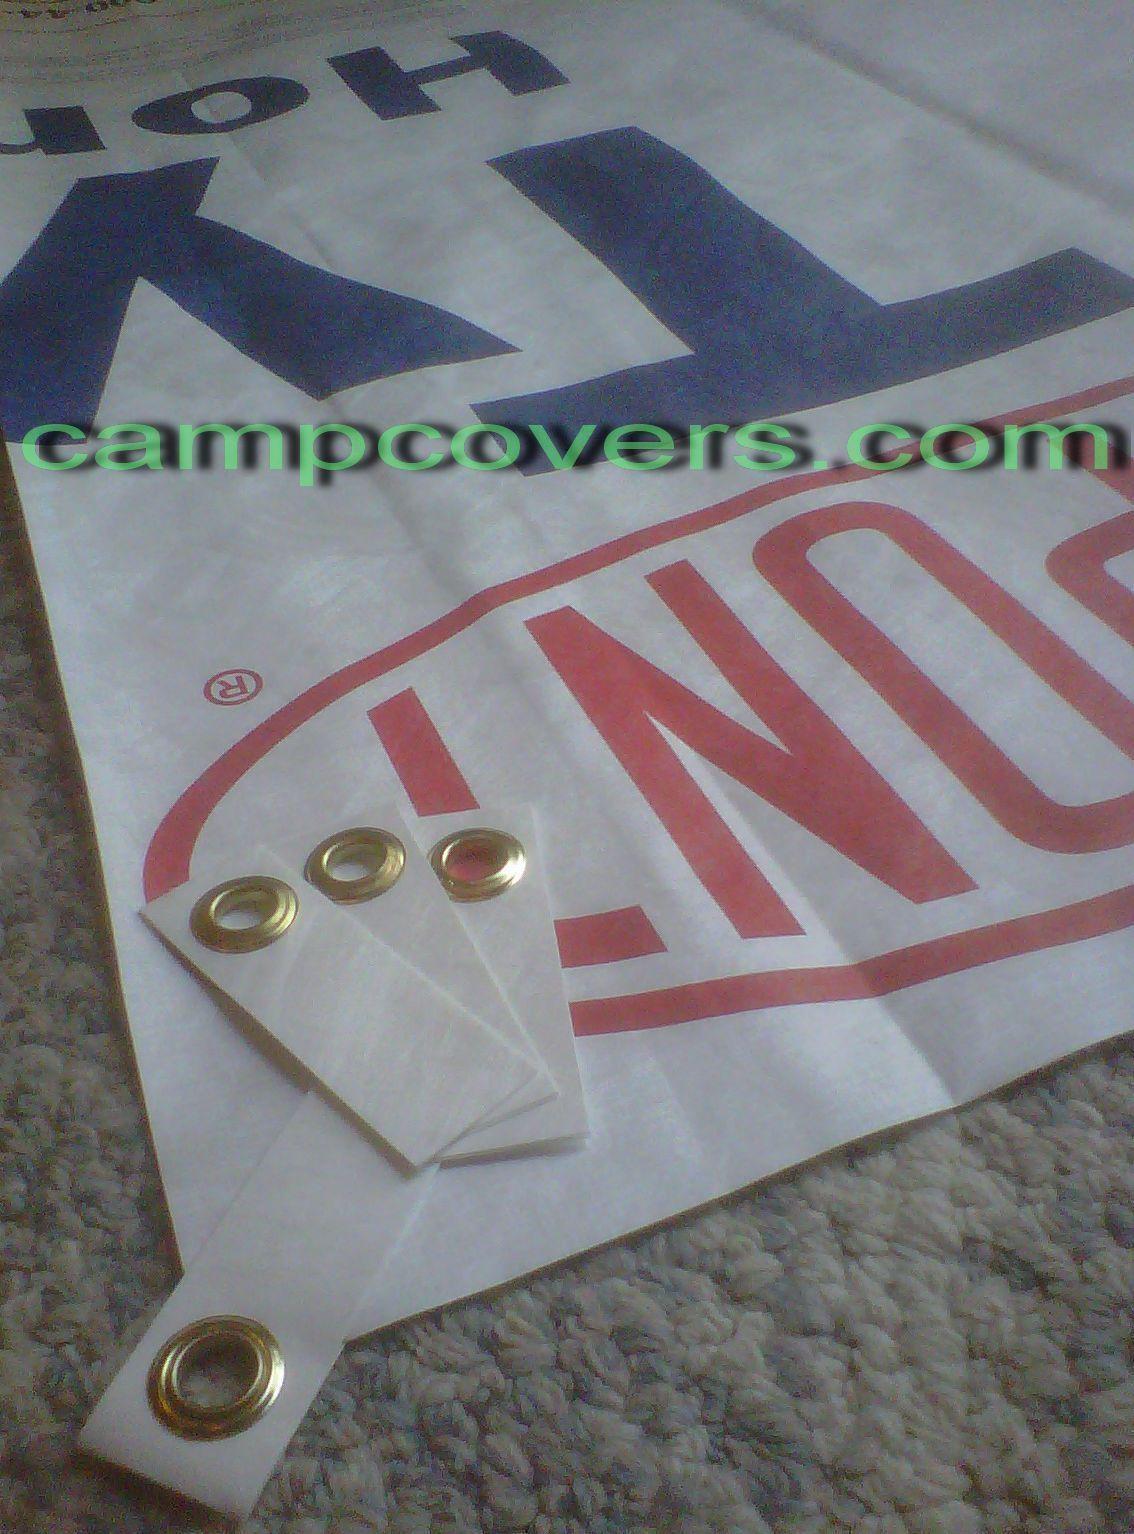 Tyvek Ground Cloth Sheet Tent Footprint 52x90 In W 6 Ultralight Grommet Tabs Tent Footprint Sheet Tent Tyvek